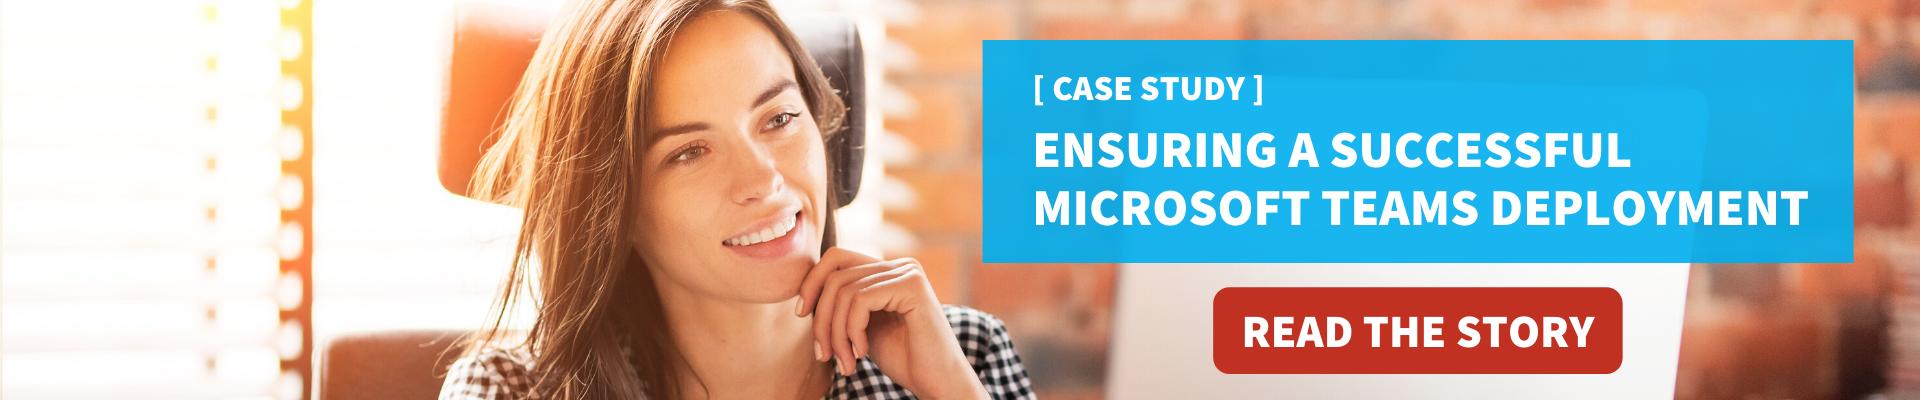 Microsoft Teams Case Study